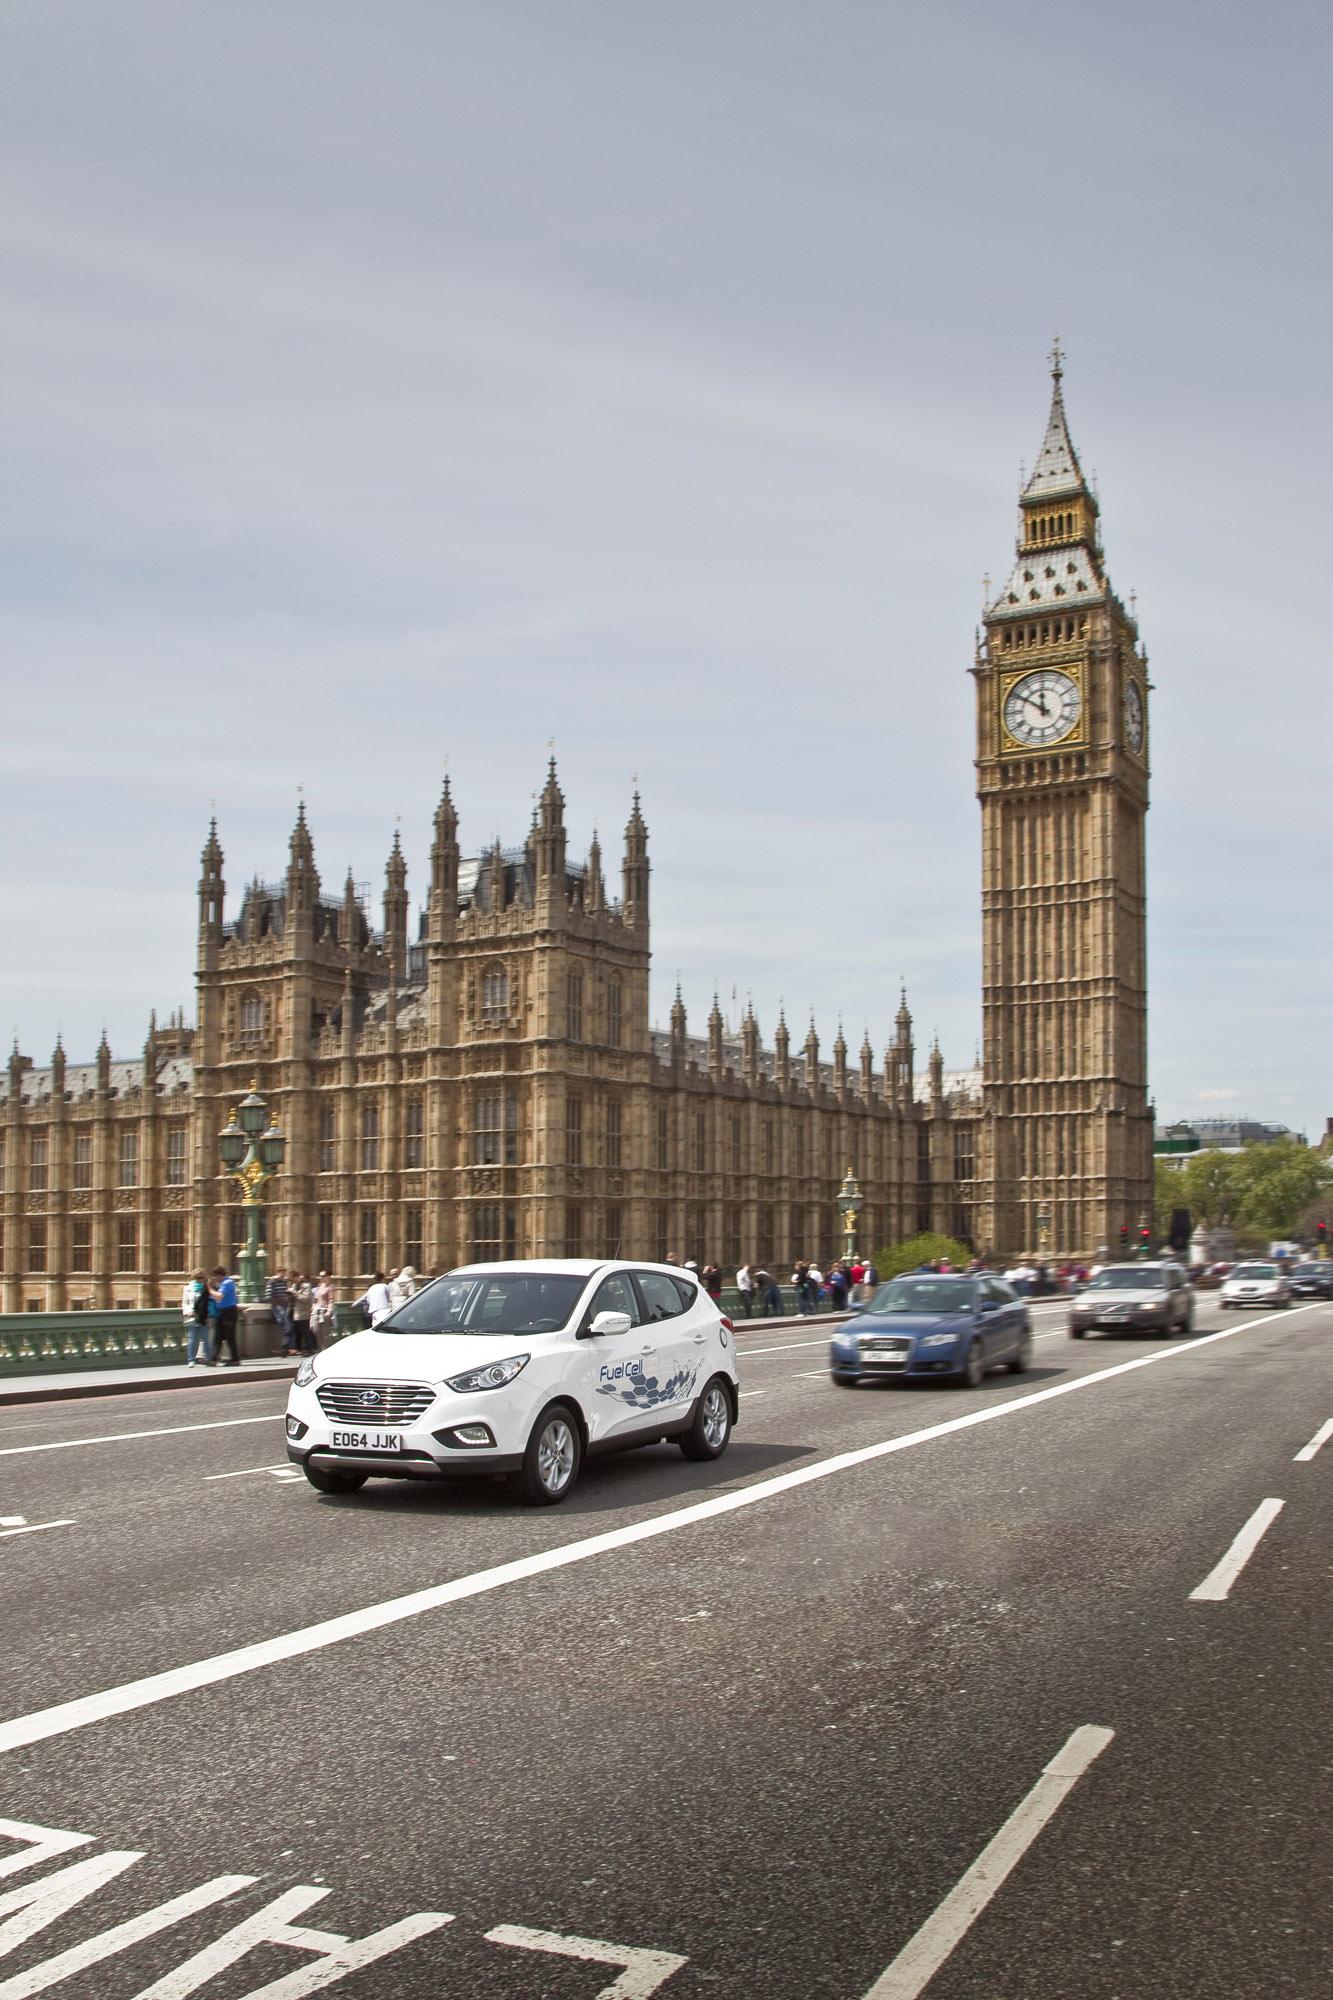 8hp90 Torqueflite Transmission Added To 2015 Dodge